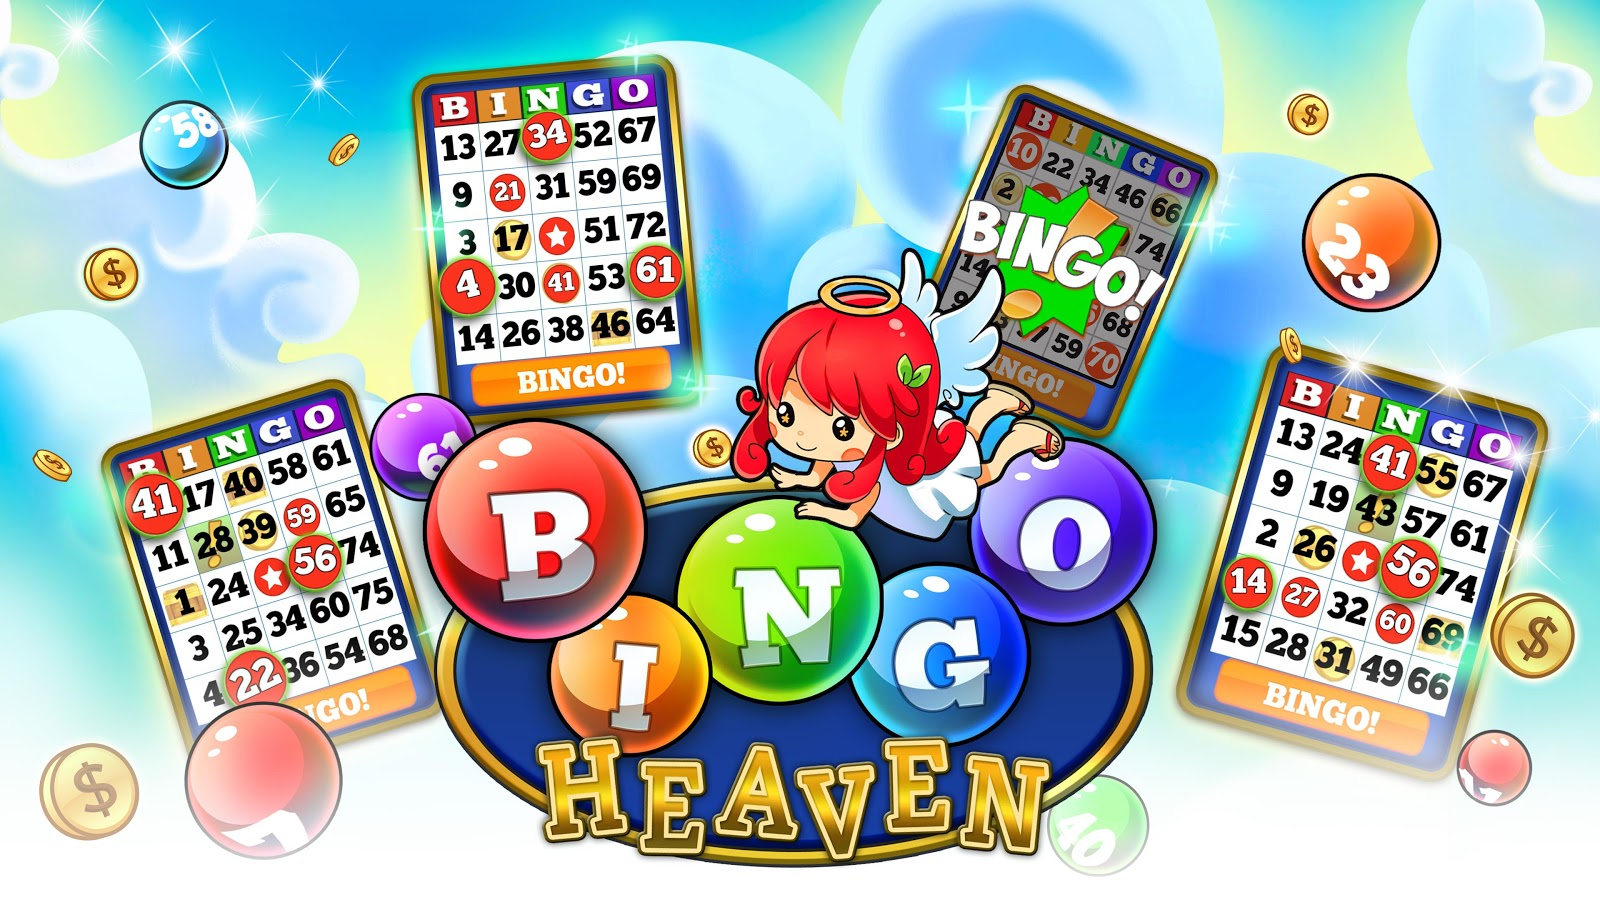 Bingo Heaven Review